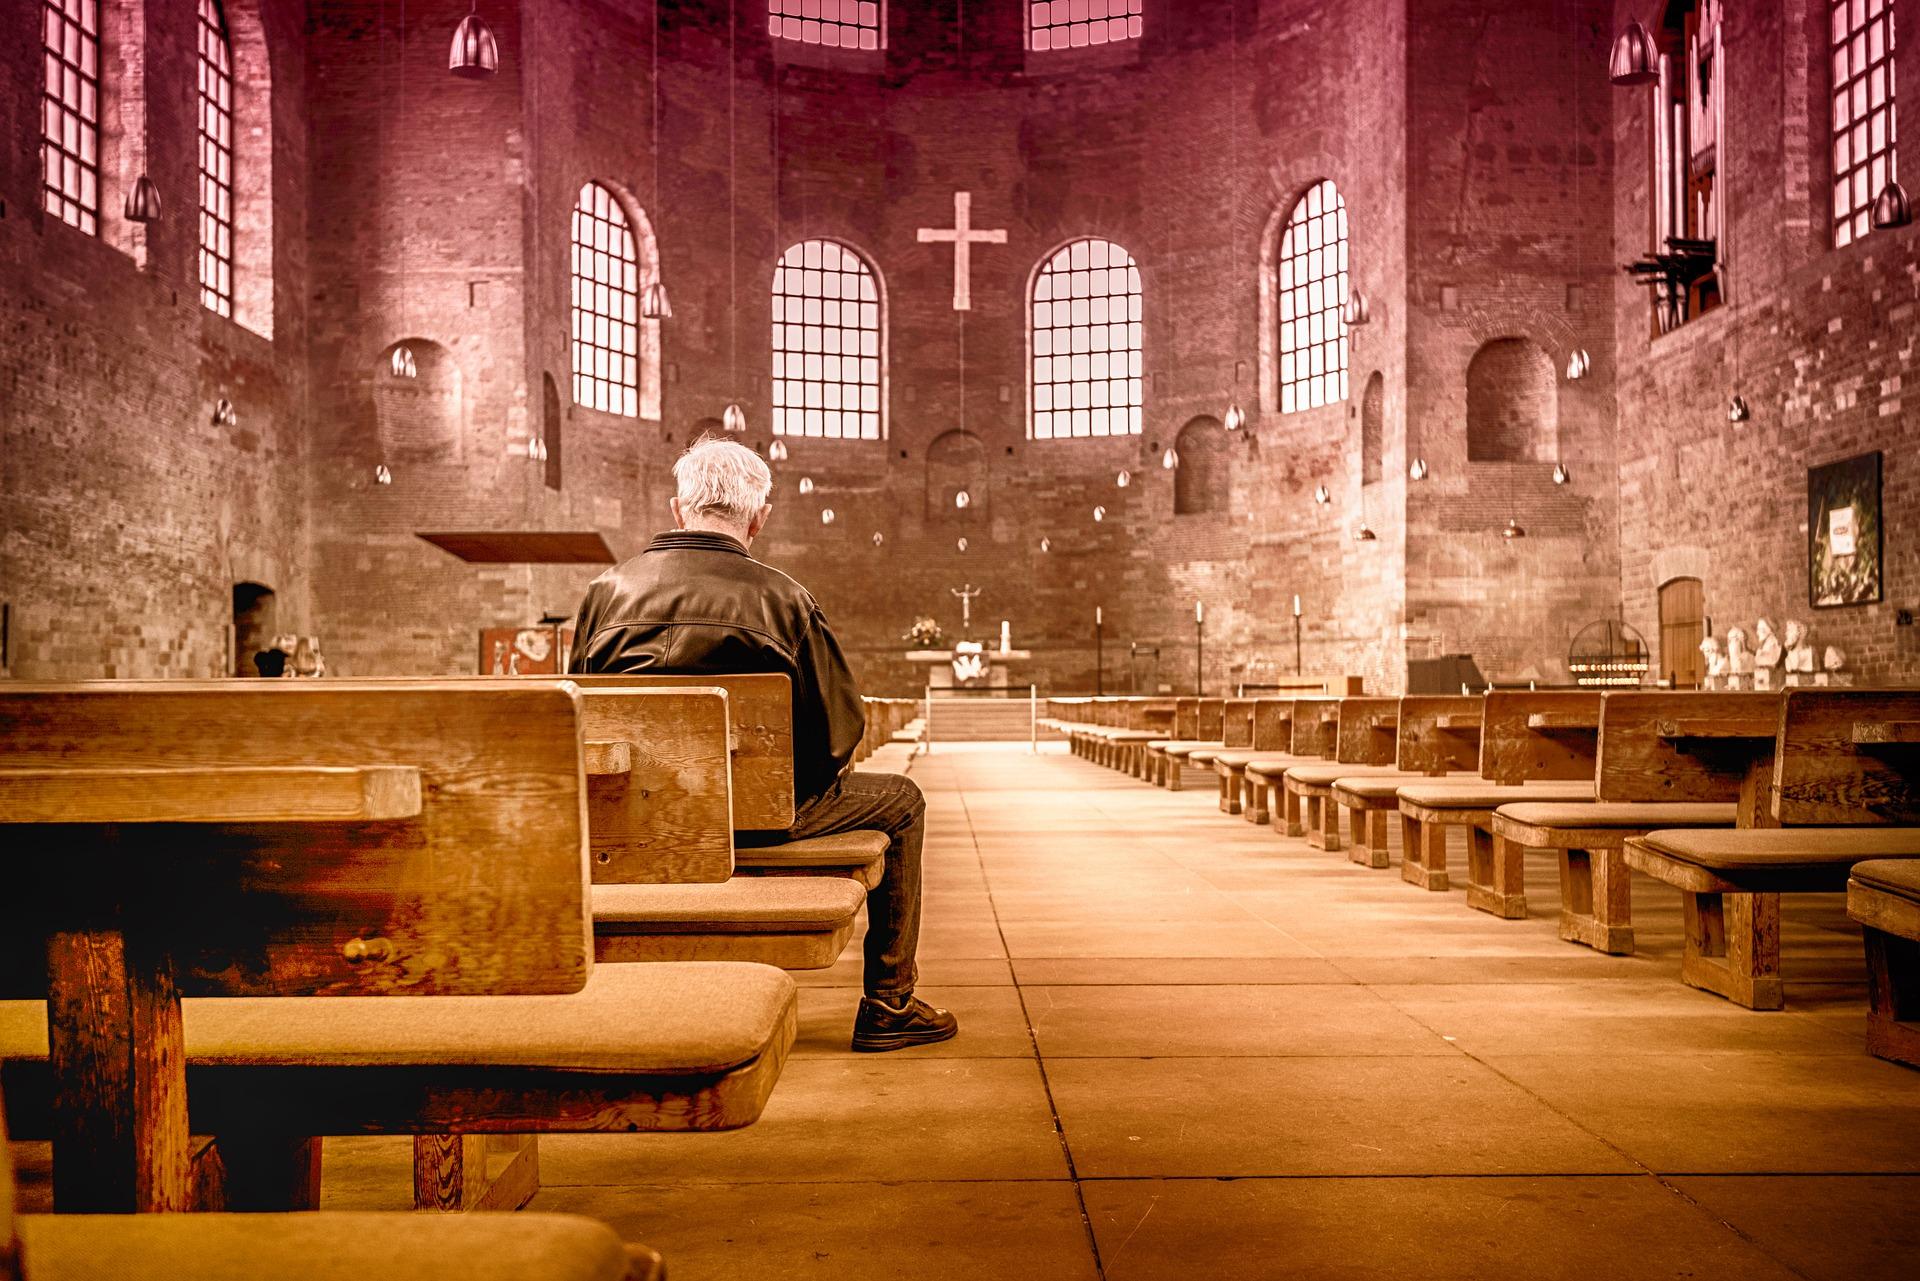 church-2464883_1920.jpg